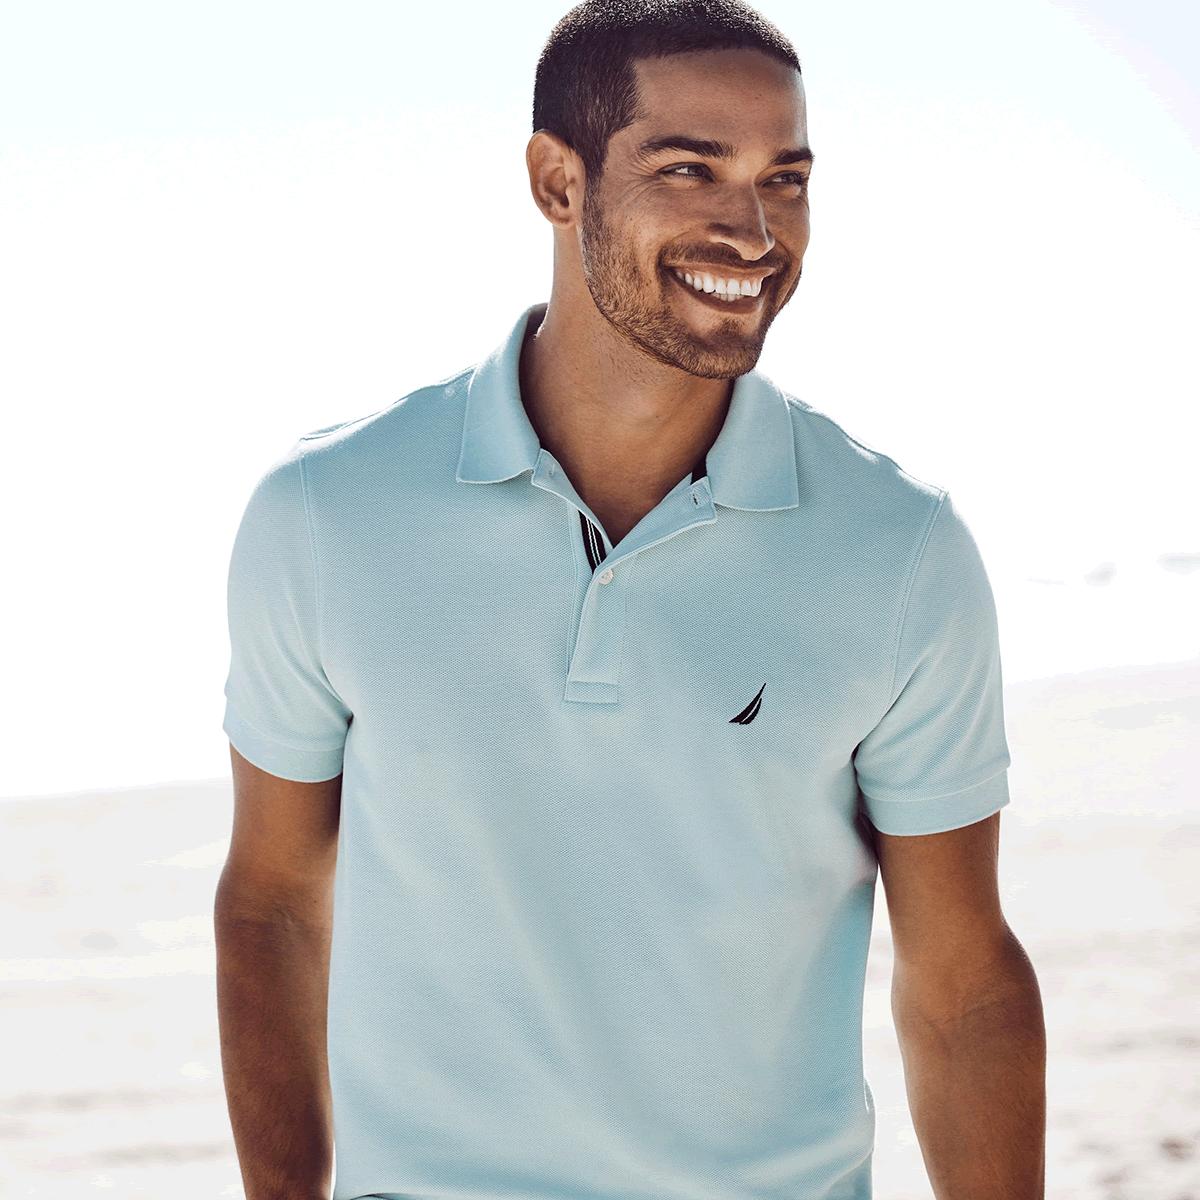 Nautica for Men - Men\'s Clothing - Macy\'s